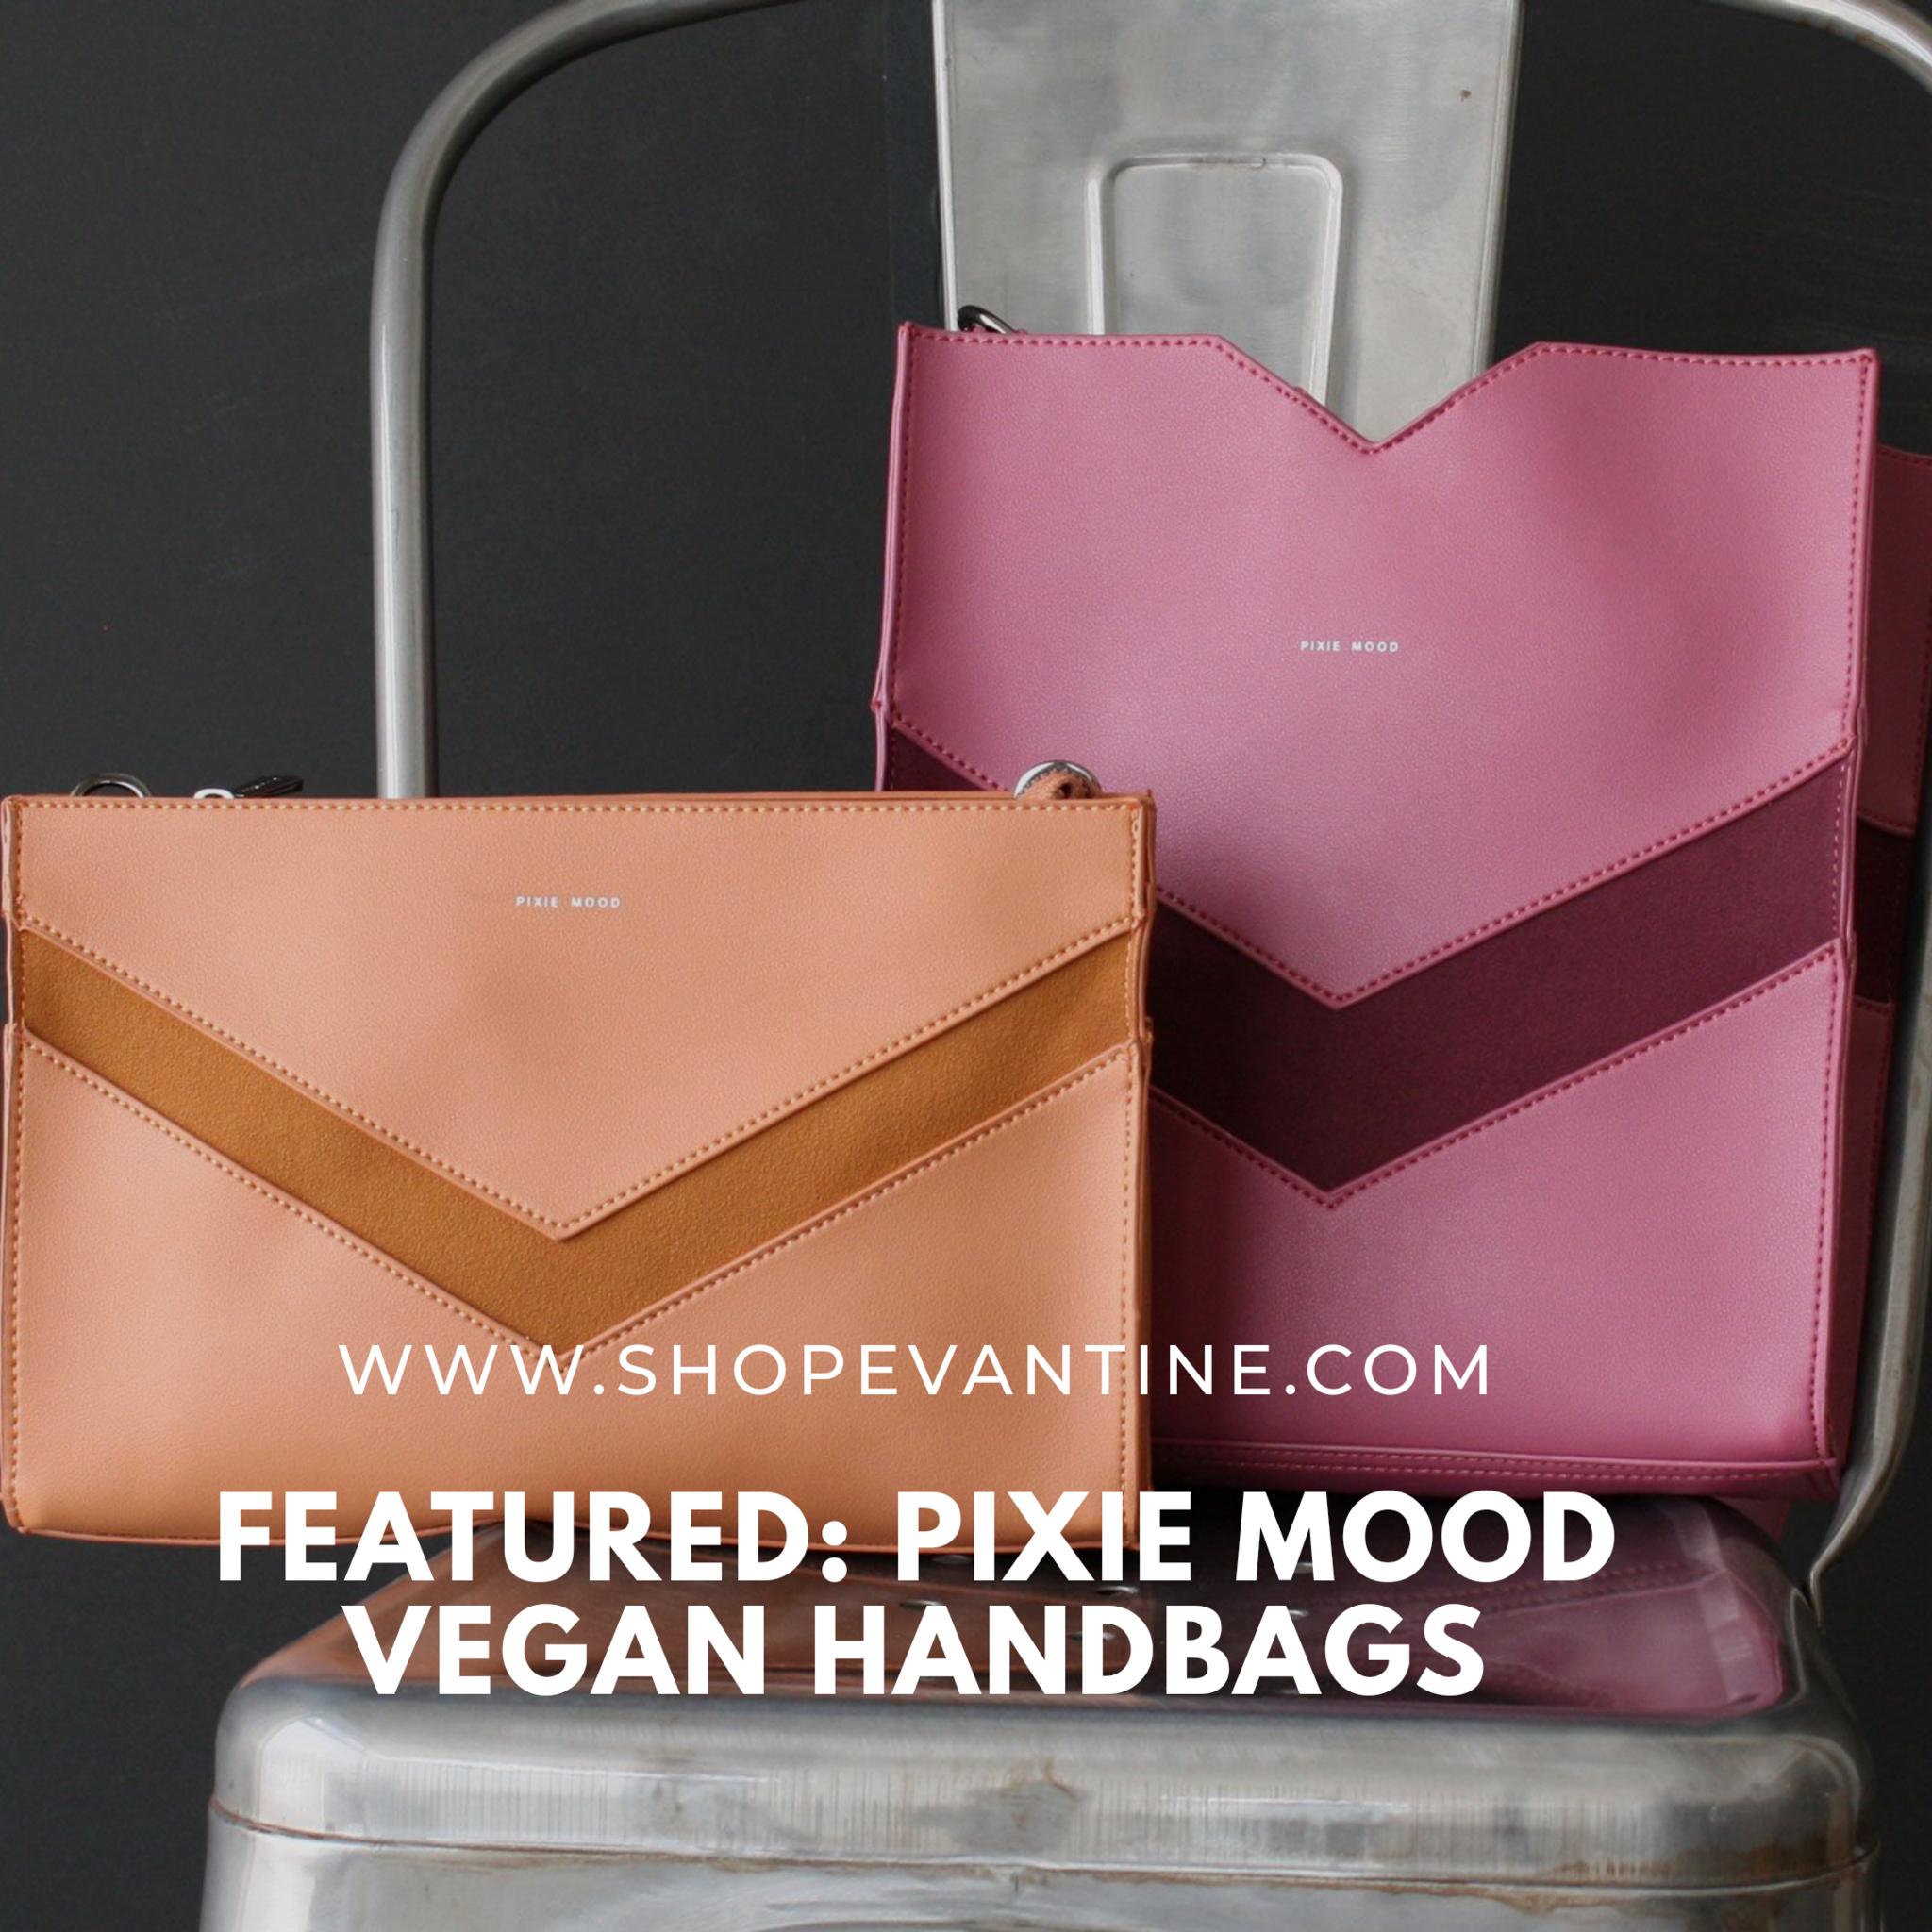 Featured: Pixie Mood Vegan Handbags